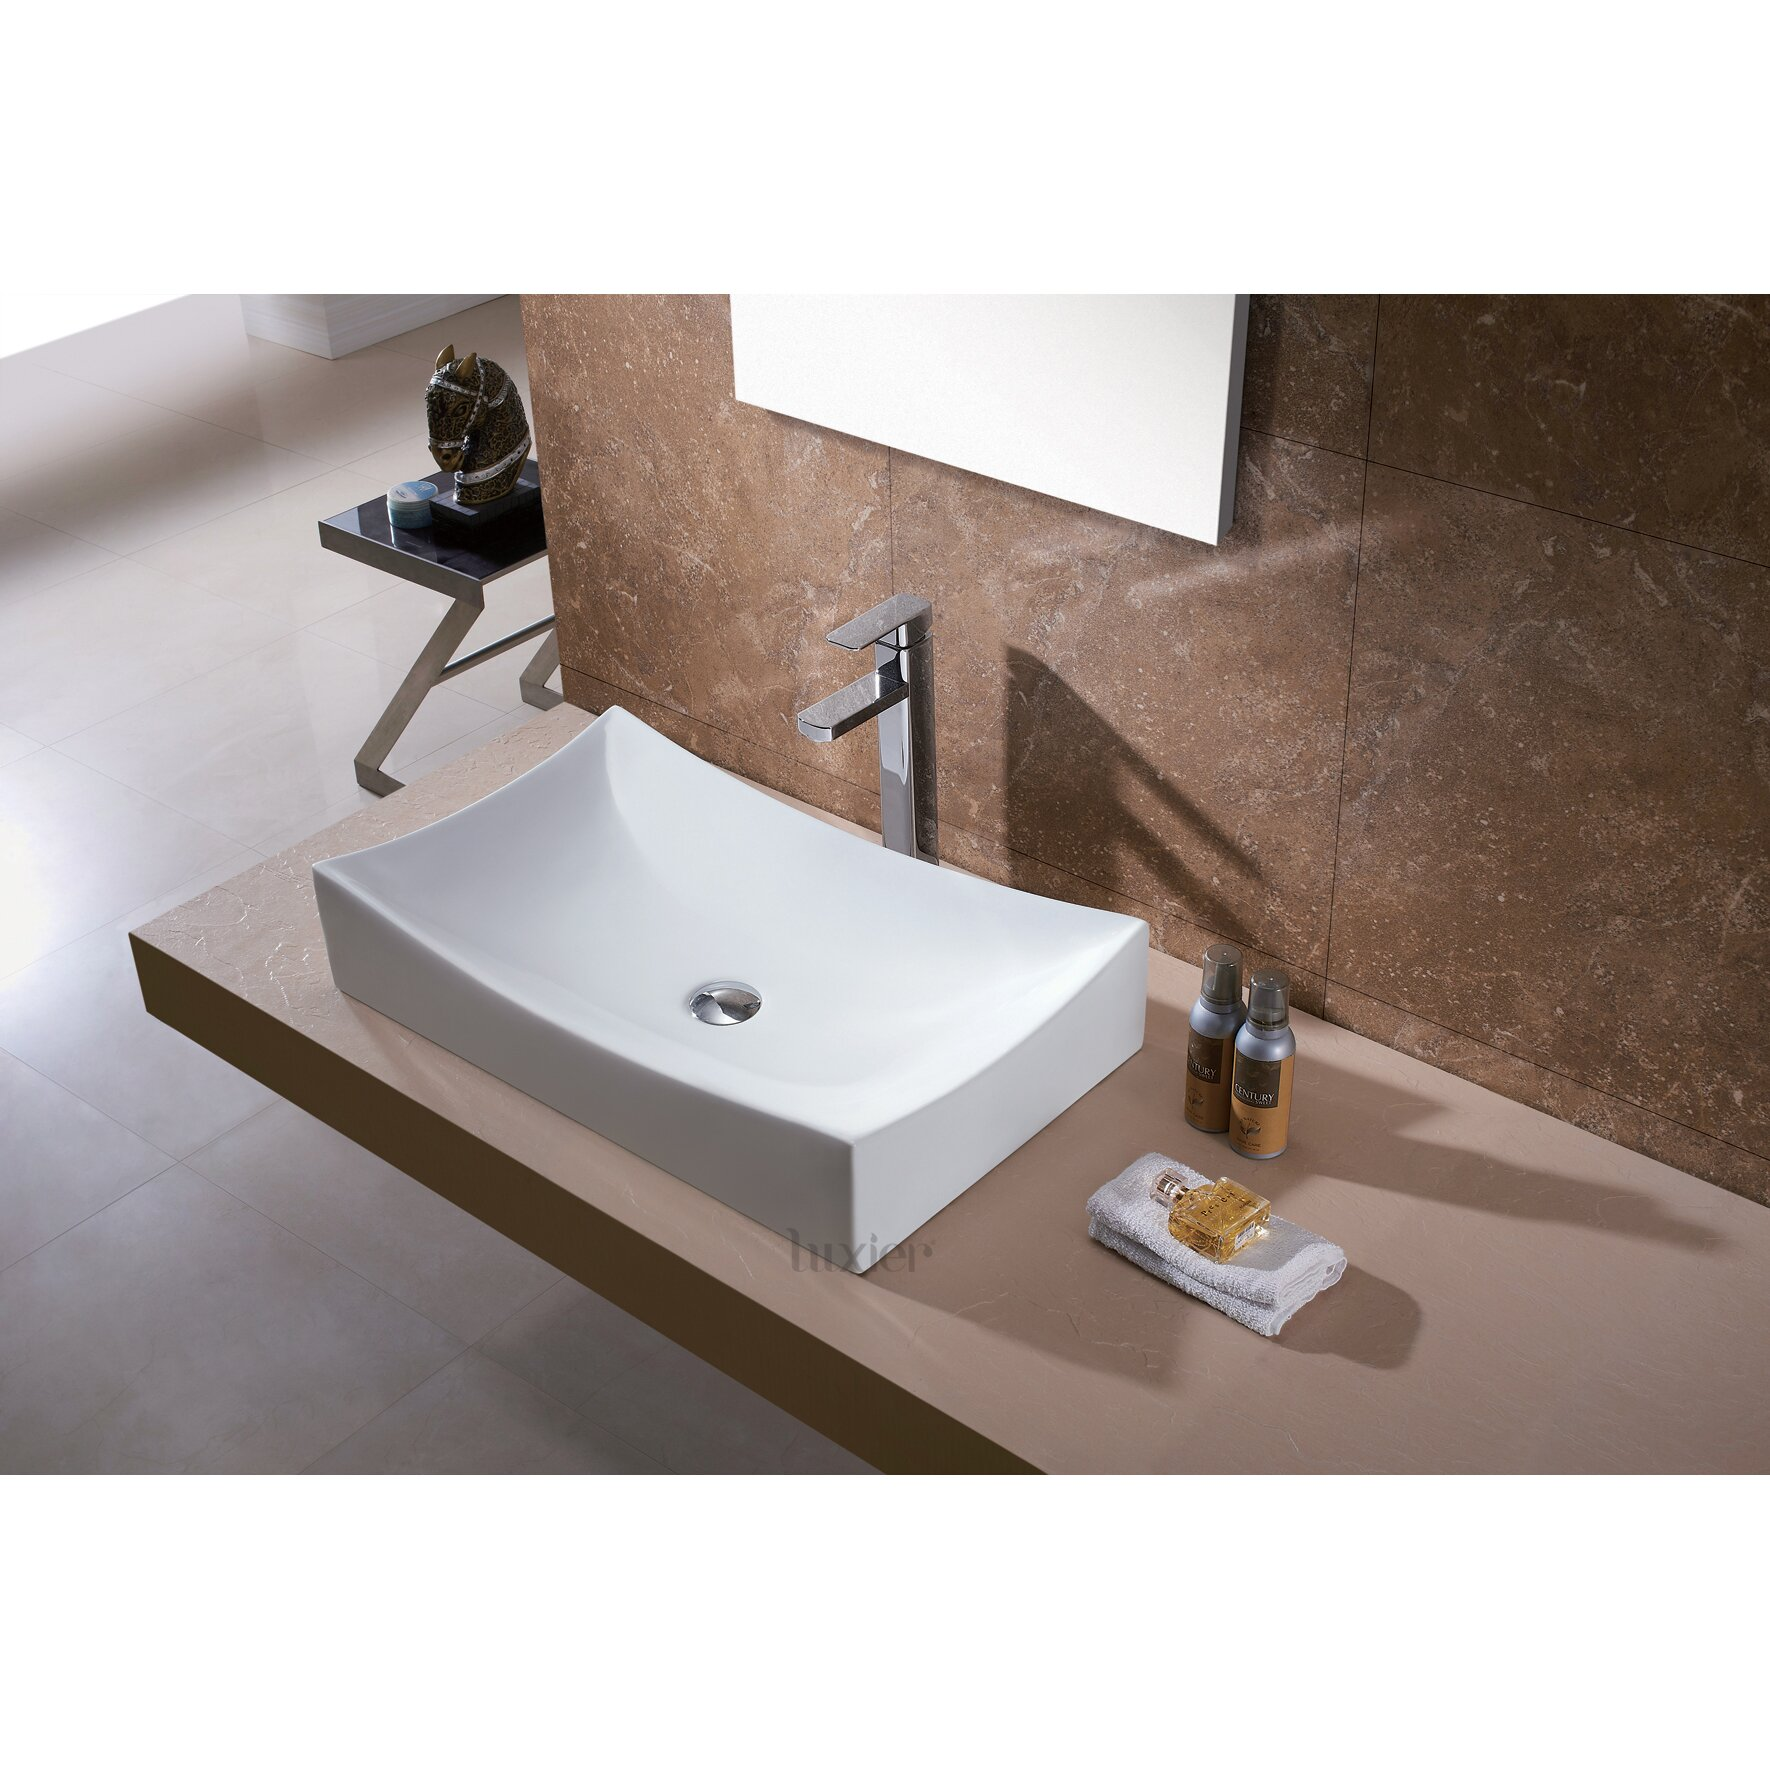 Ceramic Bathroom Basin : Porcelain-Ceramic-Vessel-Vanity-Bathroom-Sink-L-001.jpg